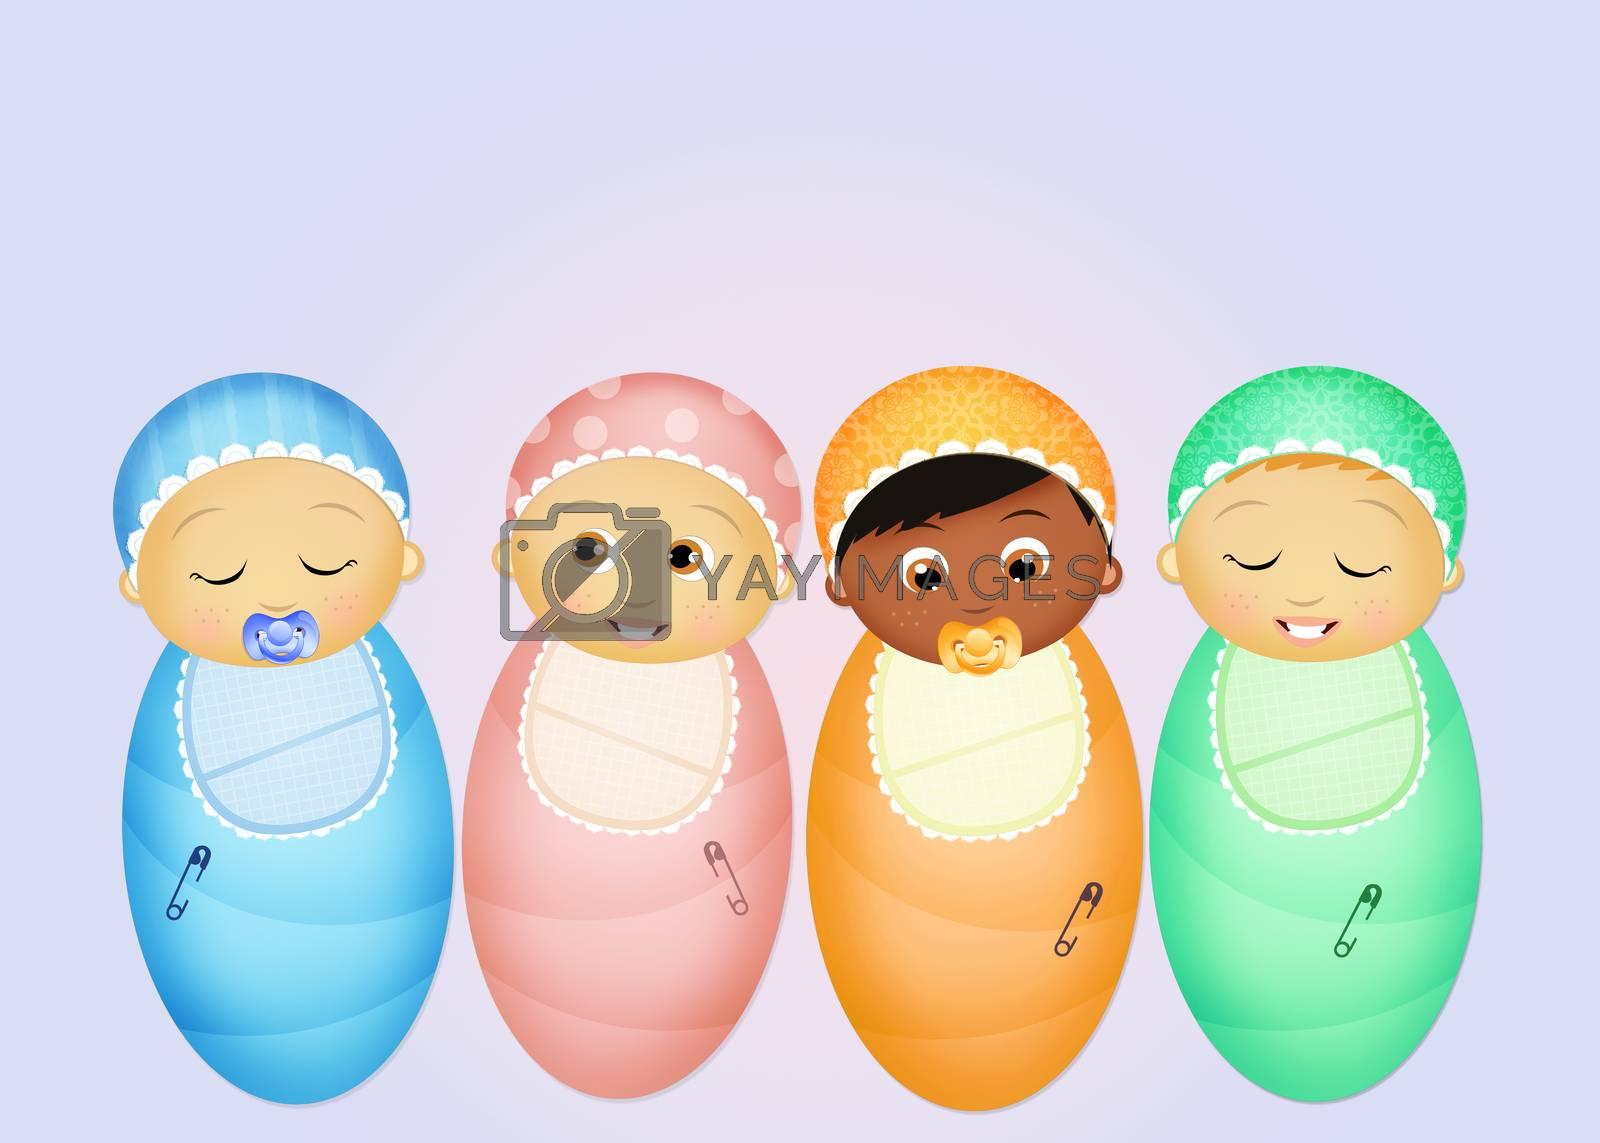 illustration of joyful babies